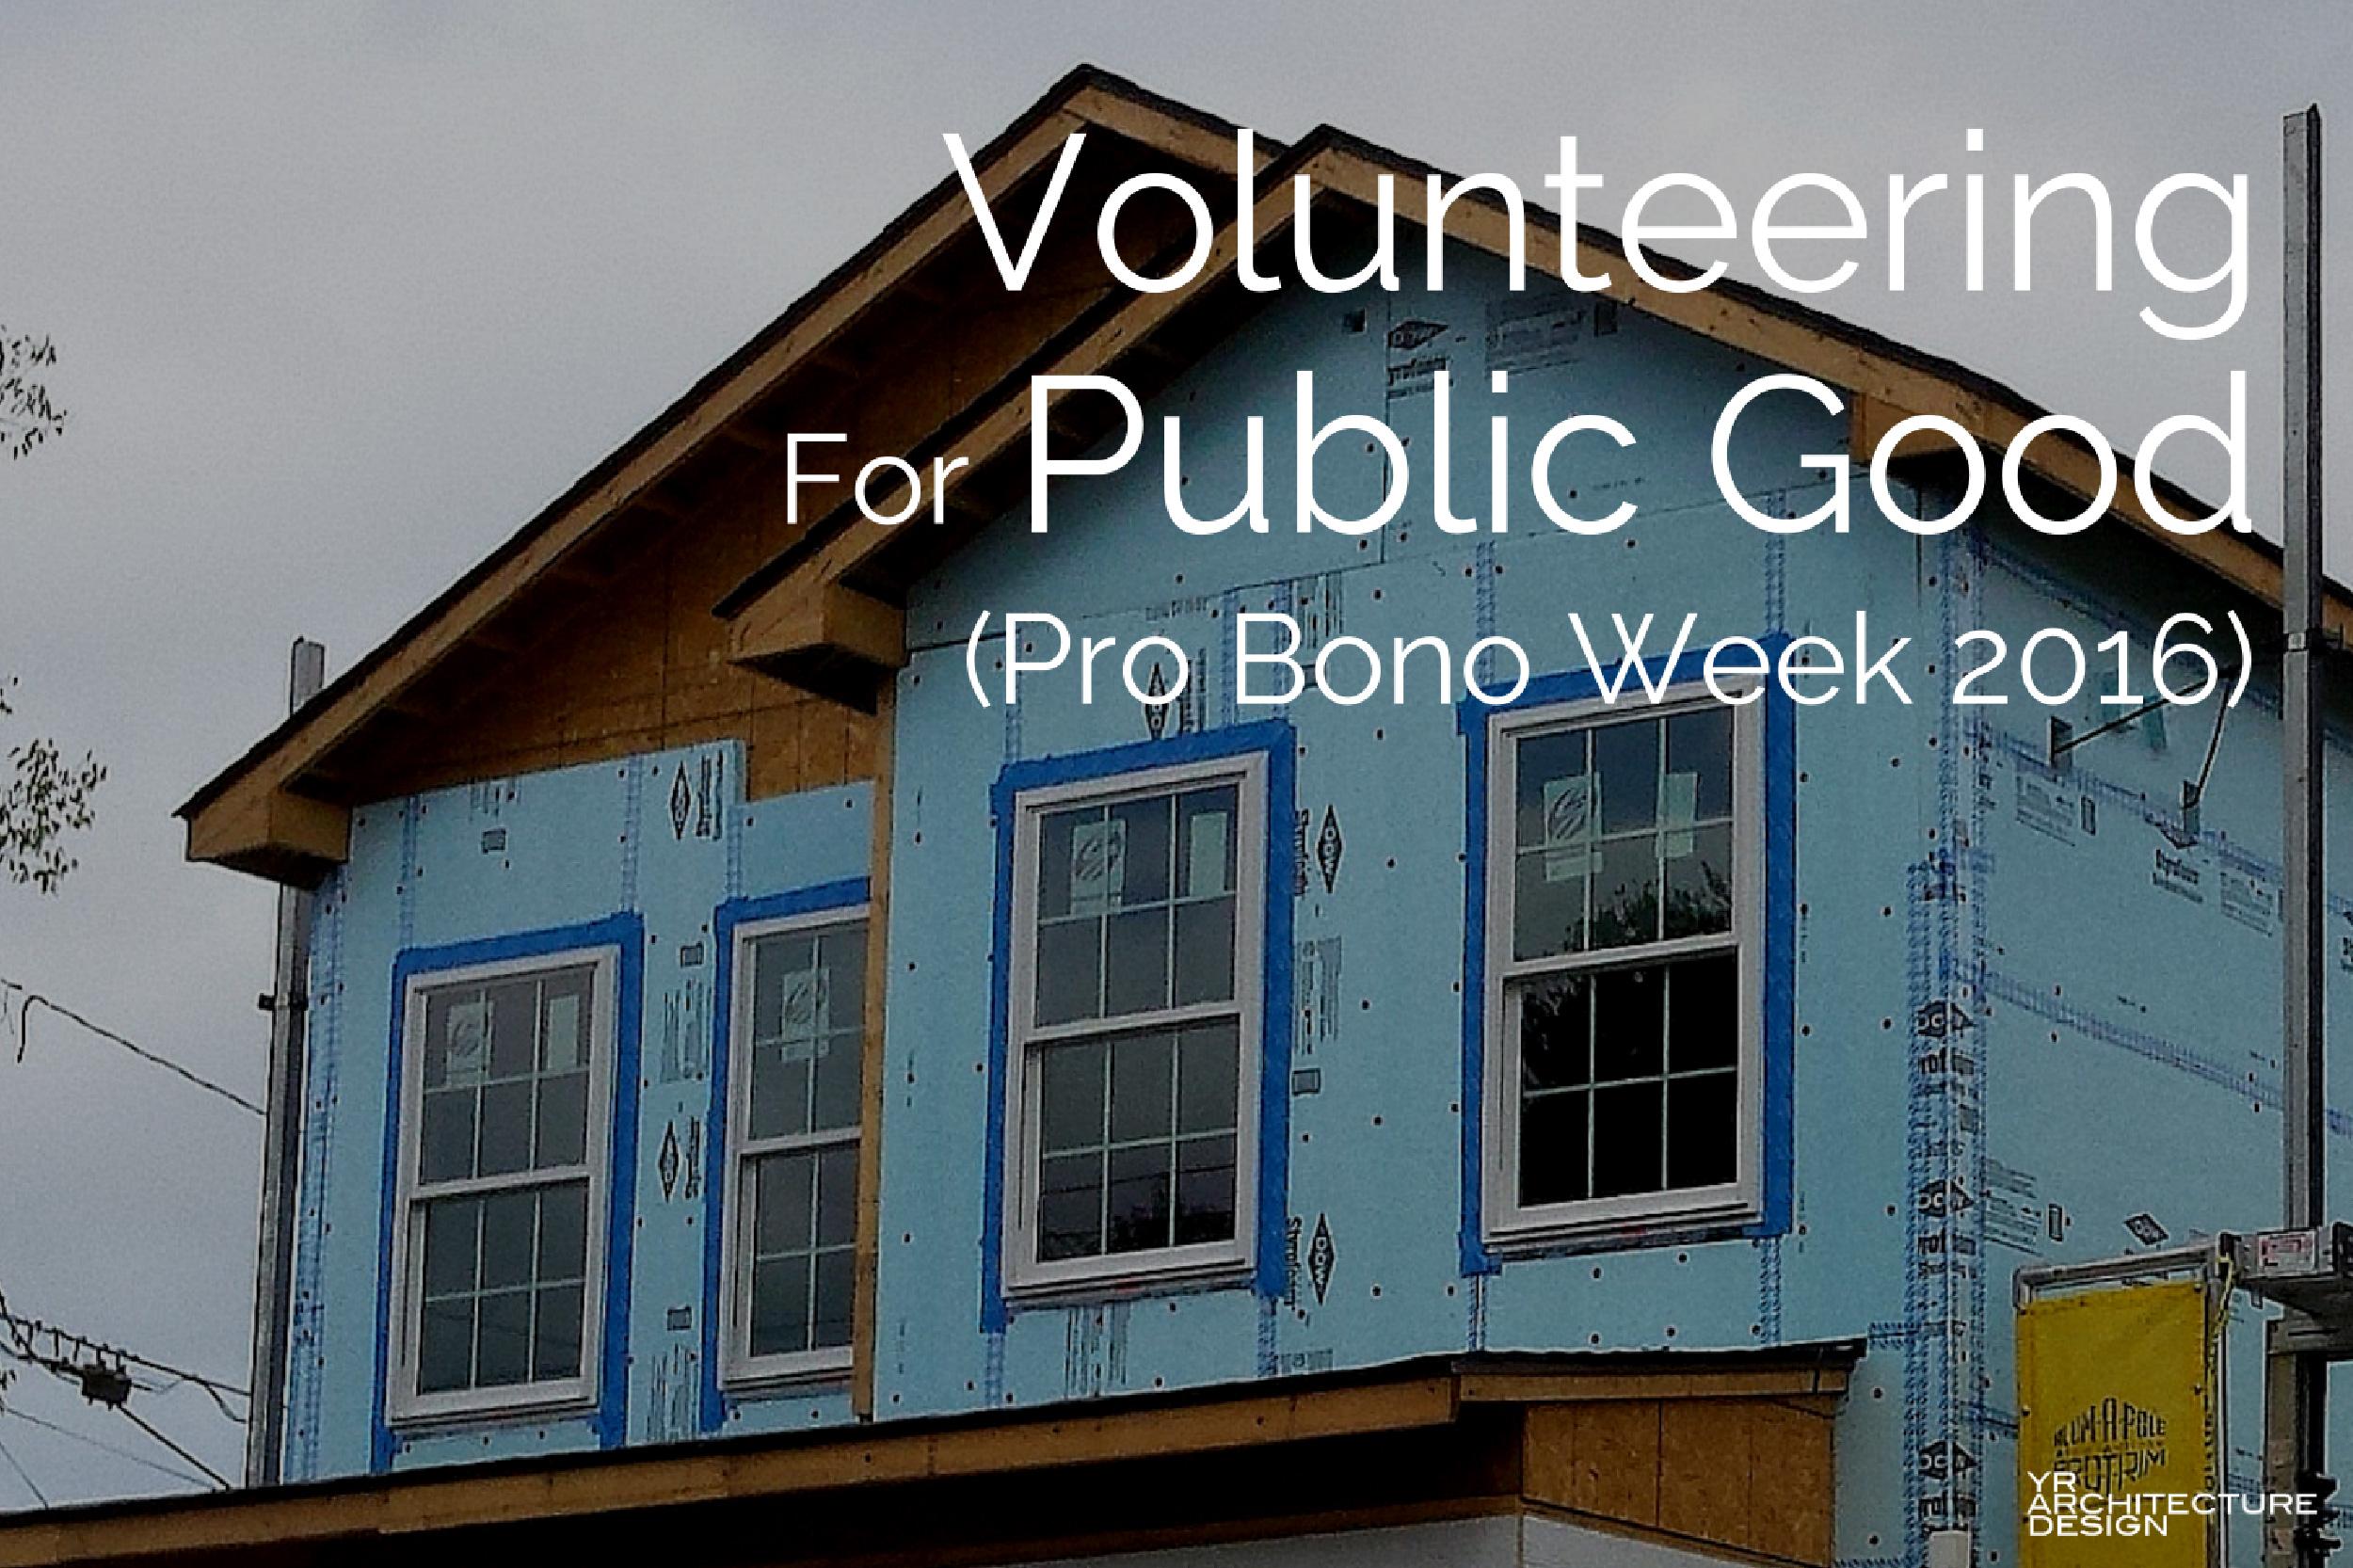 Volunteering For Public Good During Pro Bono Week 2016